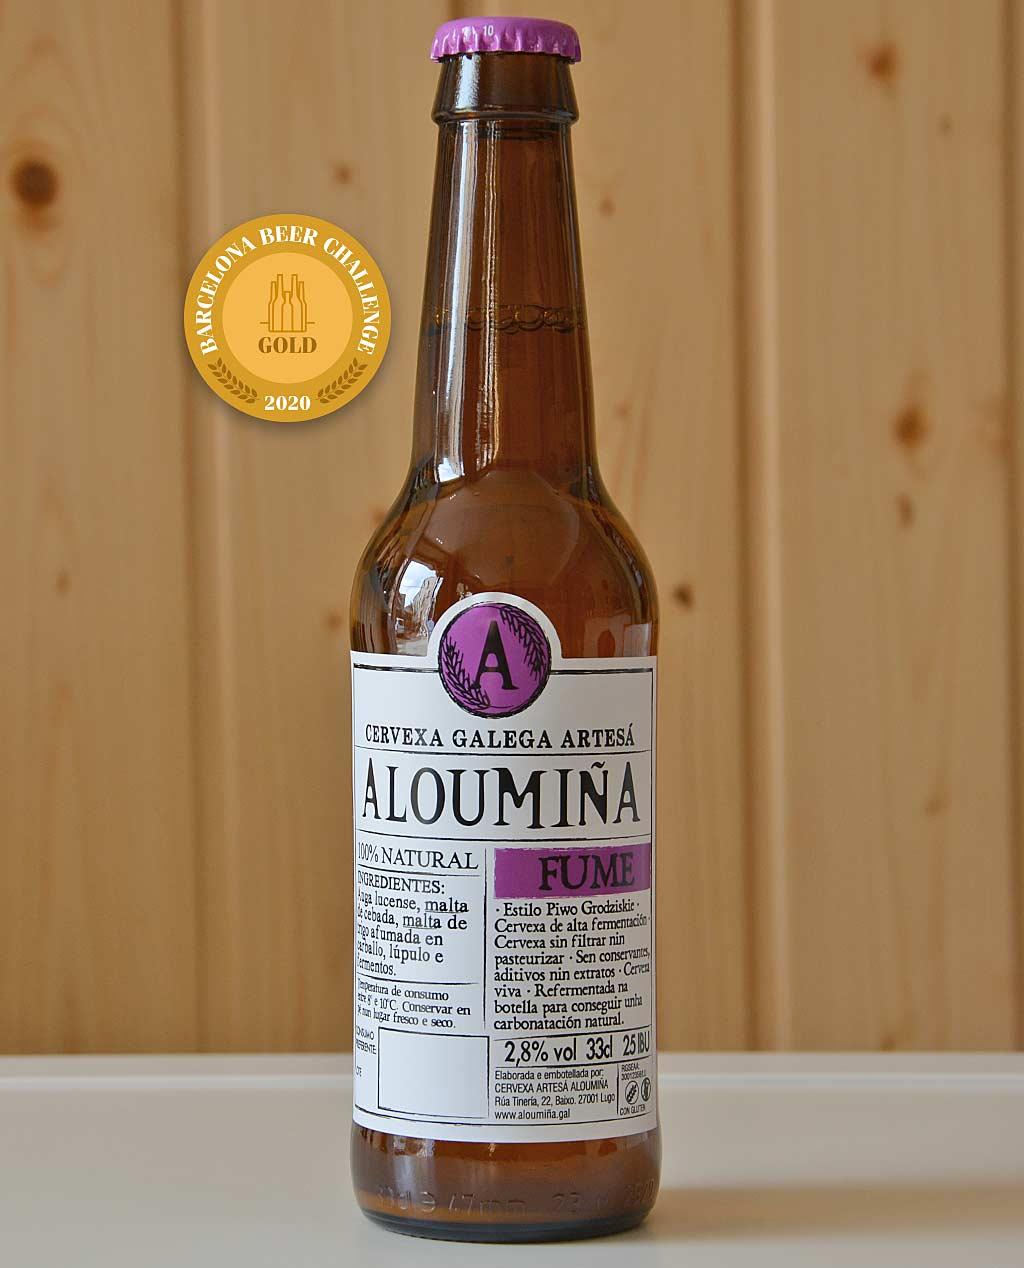 aloumina-cerveza-artesana-craft-beer-lugo-galicia-fume-piwo-grodziskie-bbc-historicalbee-1024